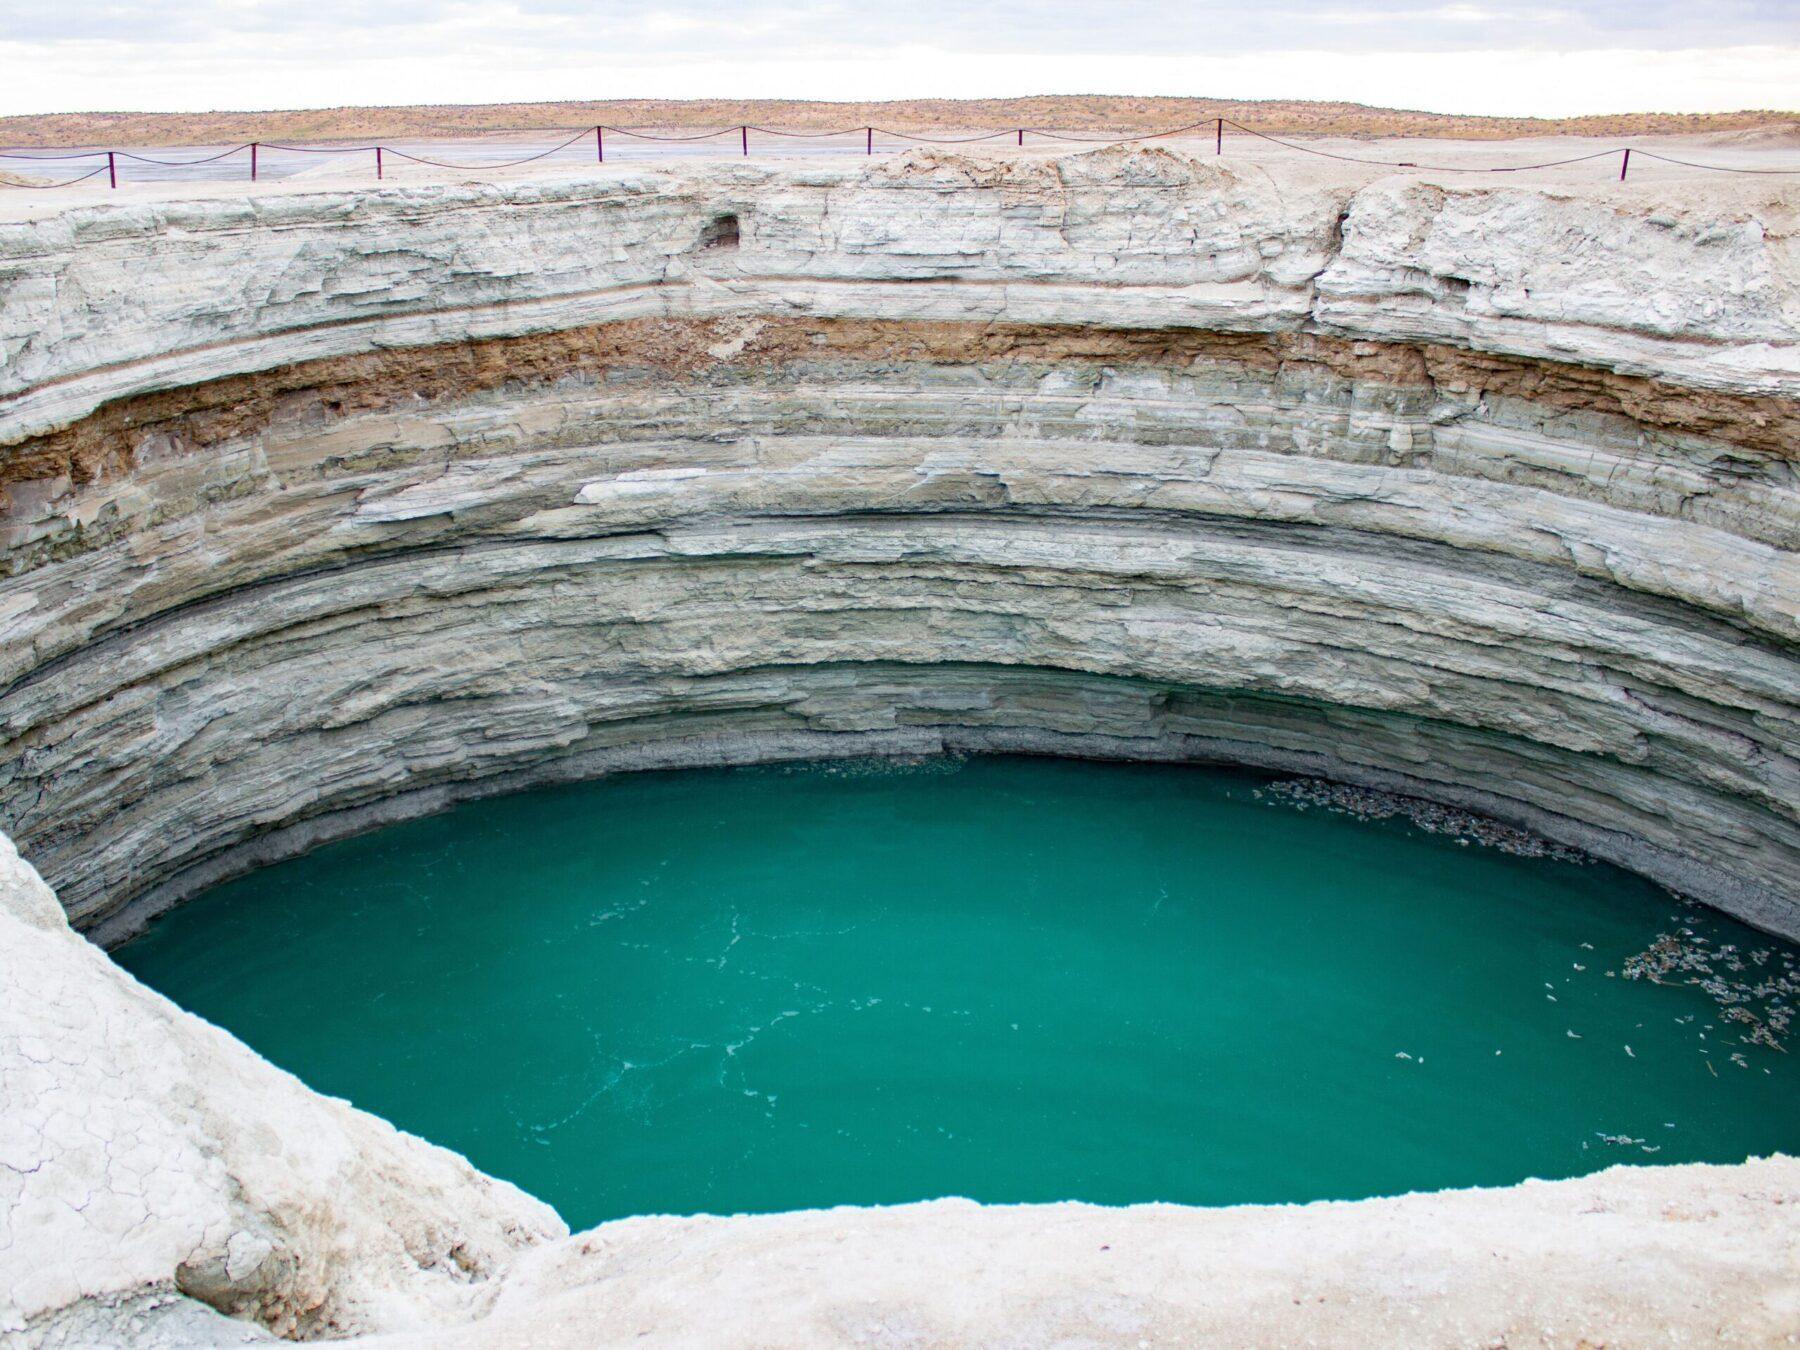 Karakum Ørken